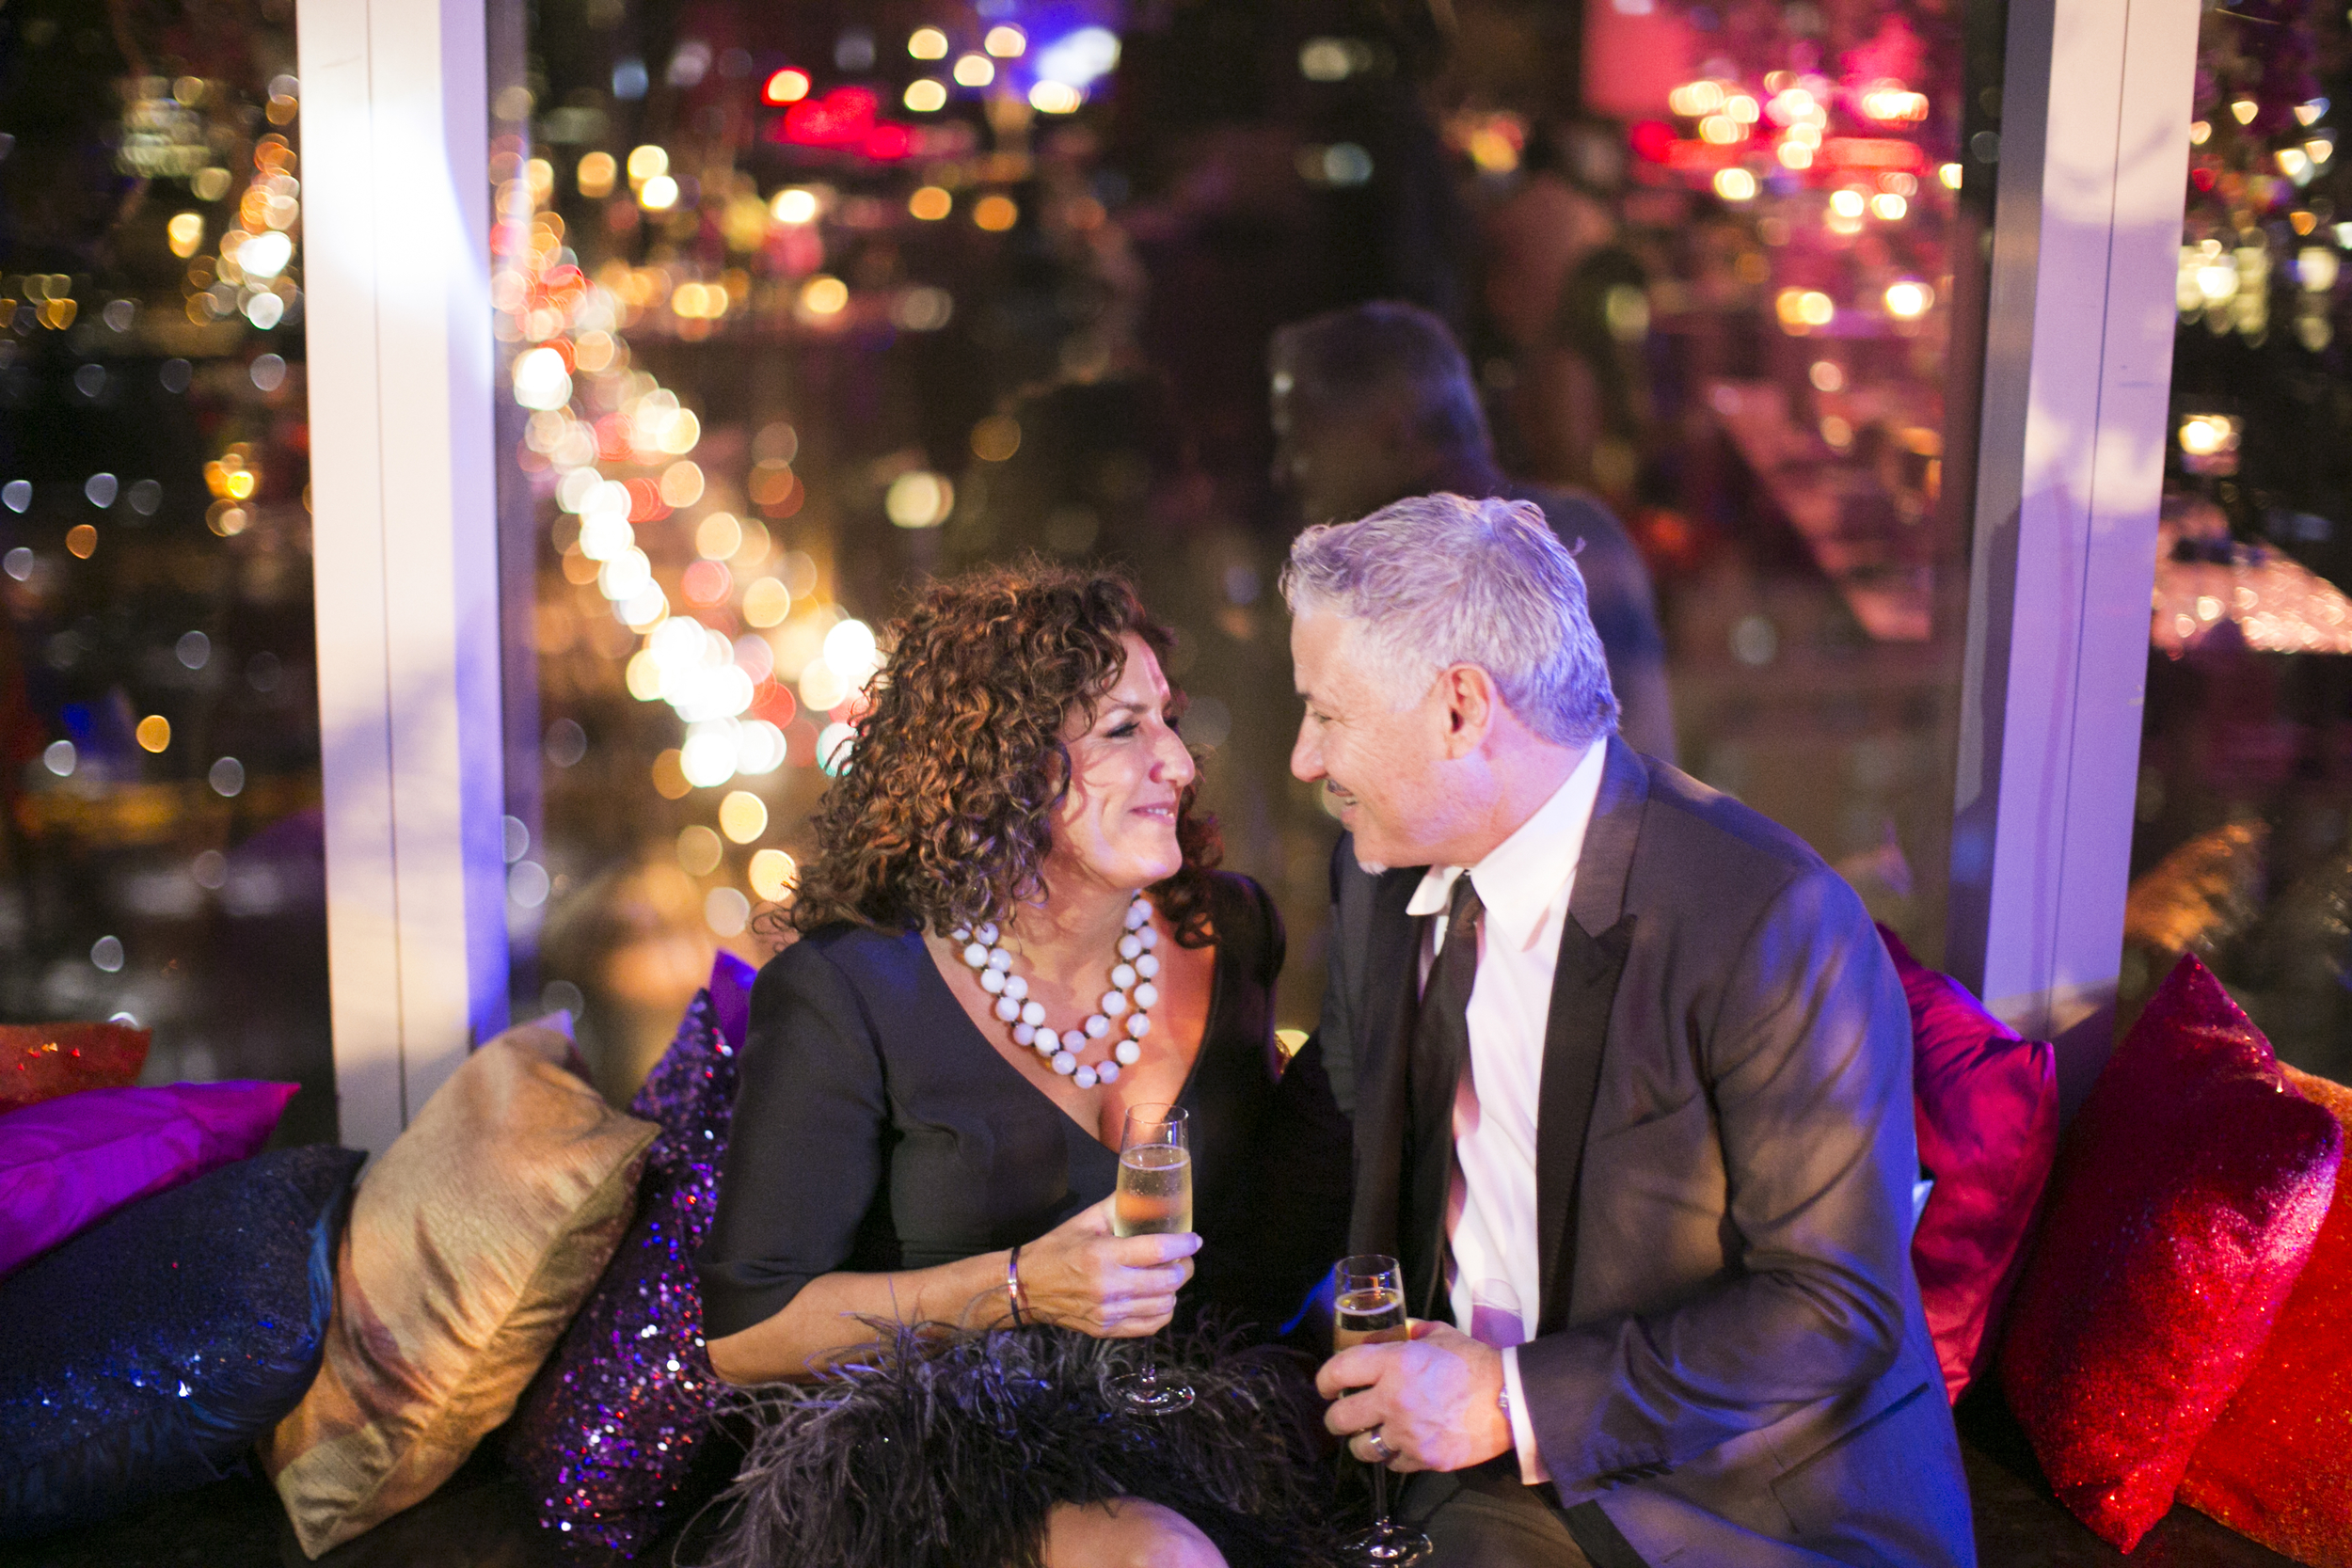 NYC-Wedding-Planner-Andrea-Freeman-Events-Mandarin-Oriental-20.jpg